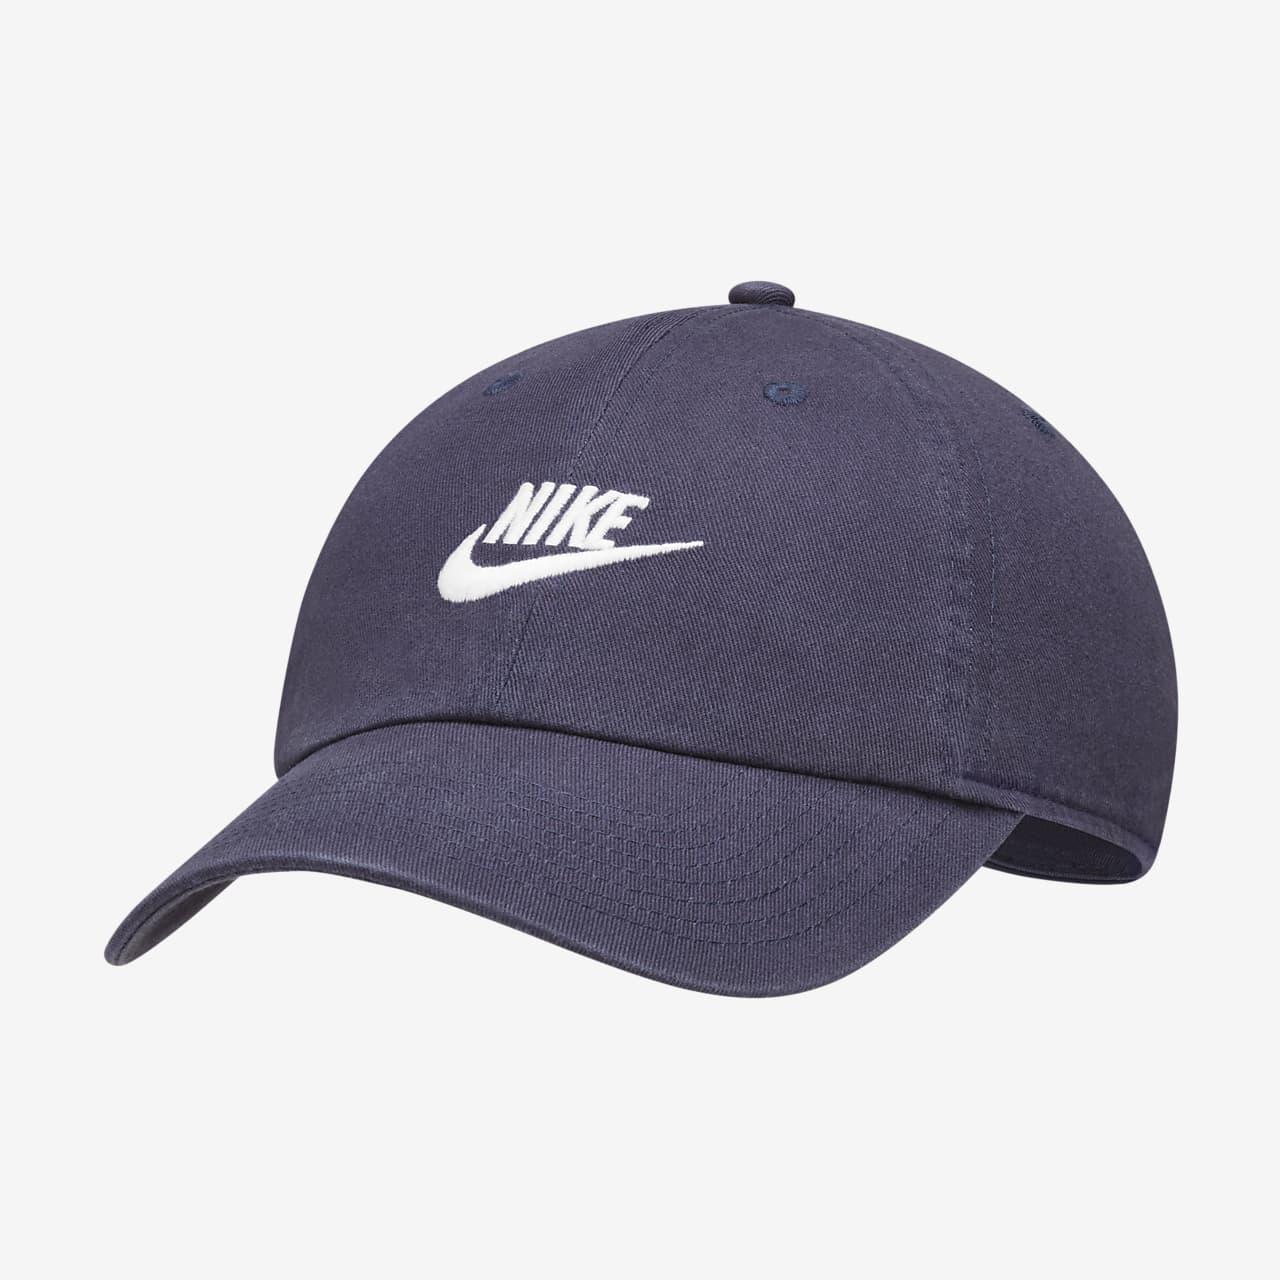 8ce9044291c Nike Sportswear Heritage86 Futura Washed Hat. Nike.com IE